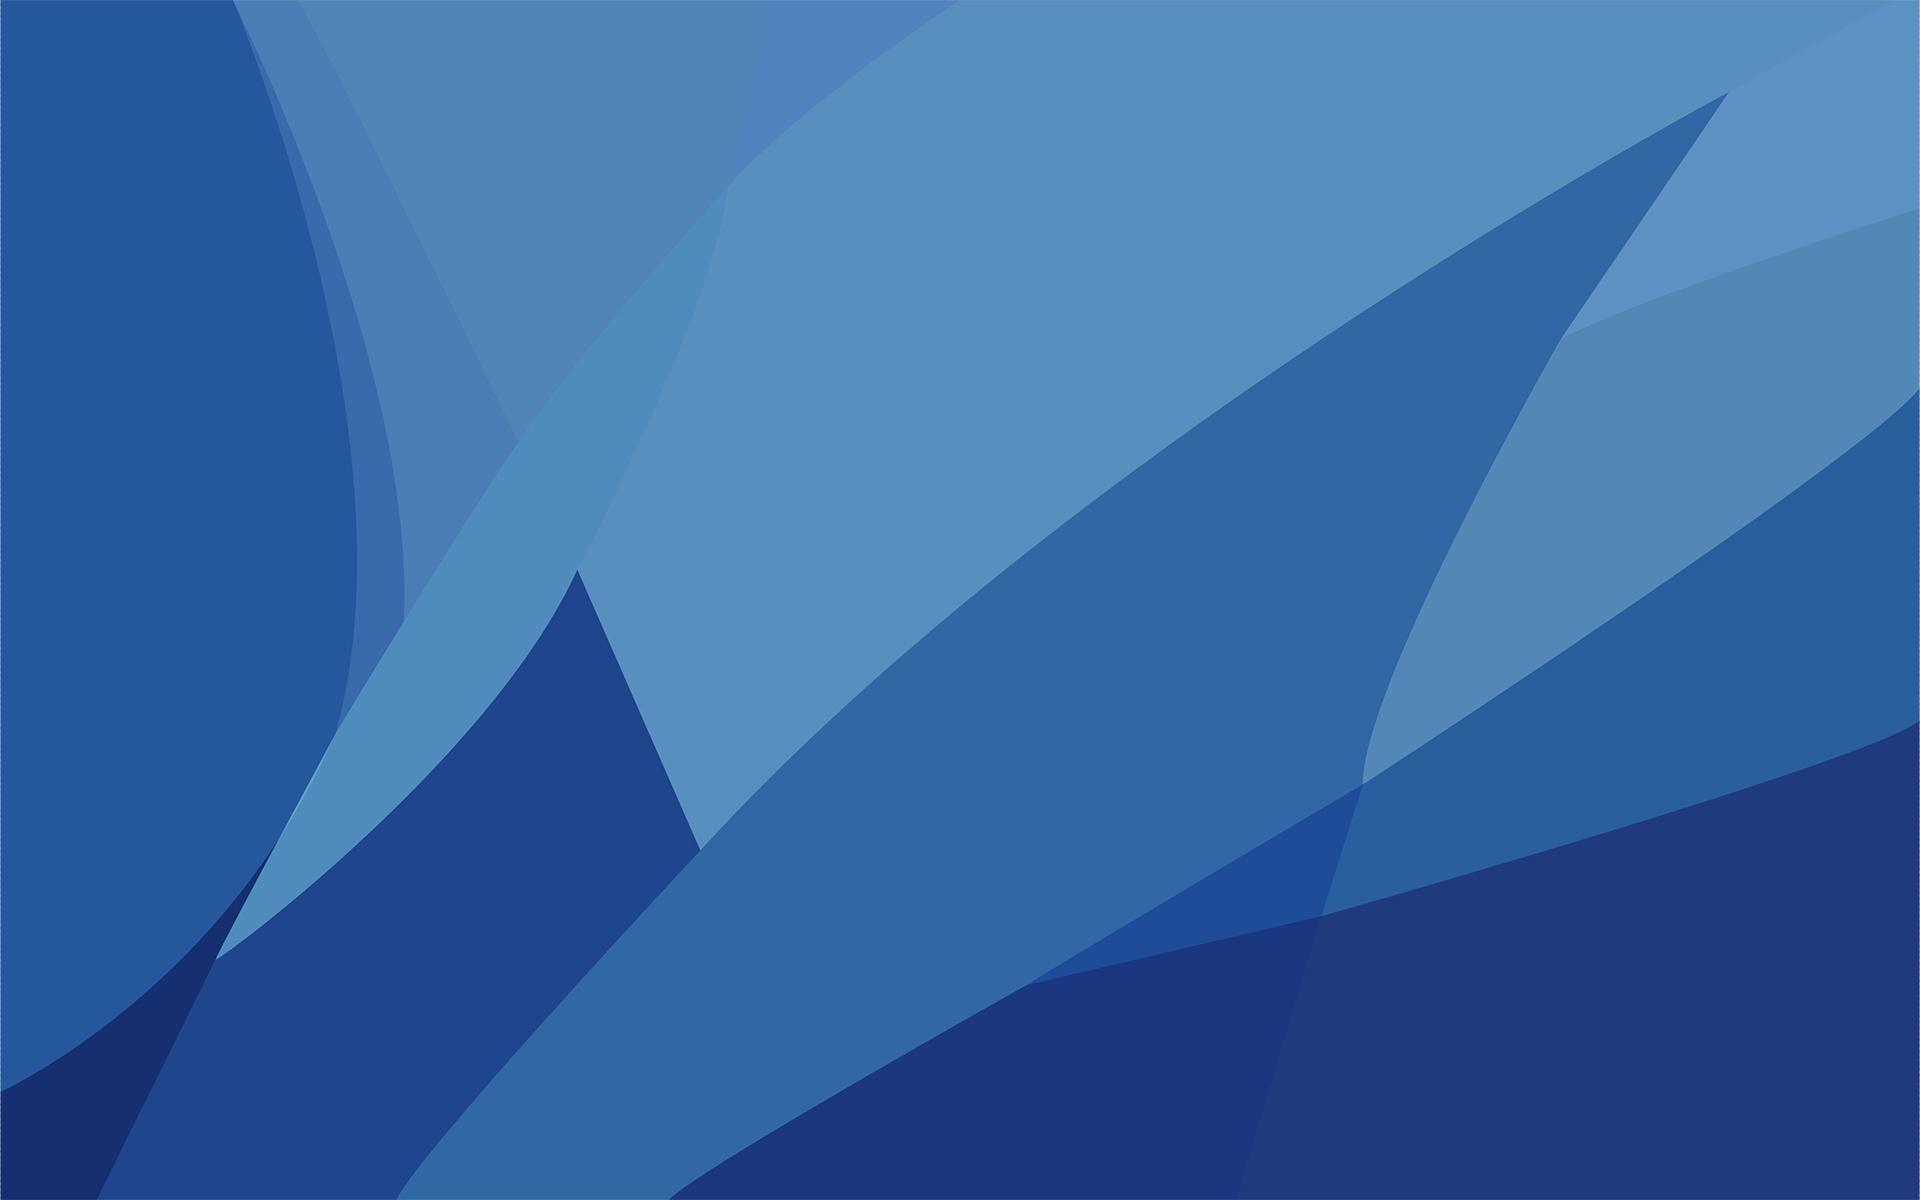 wallpaper.wiki-Flat-Design-Wallpapers-HD-Free-Download-